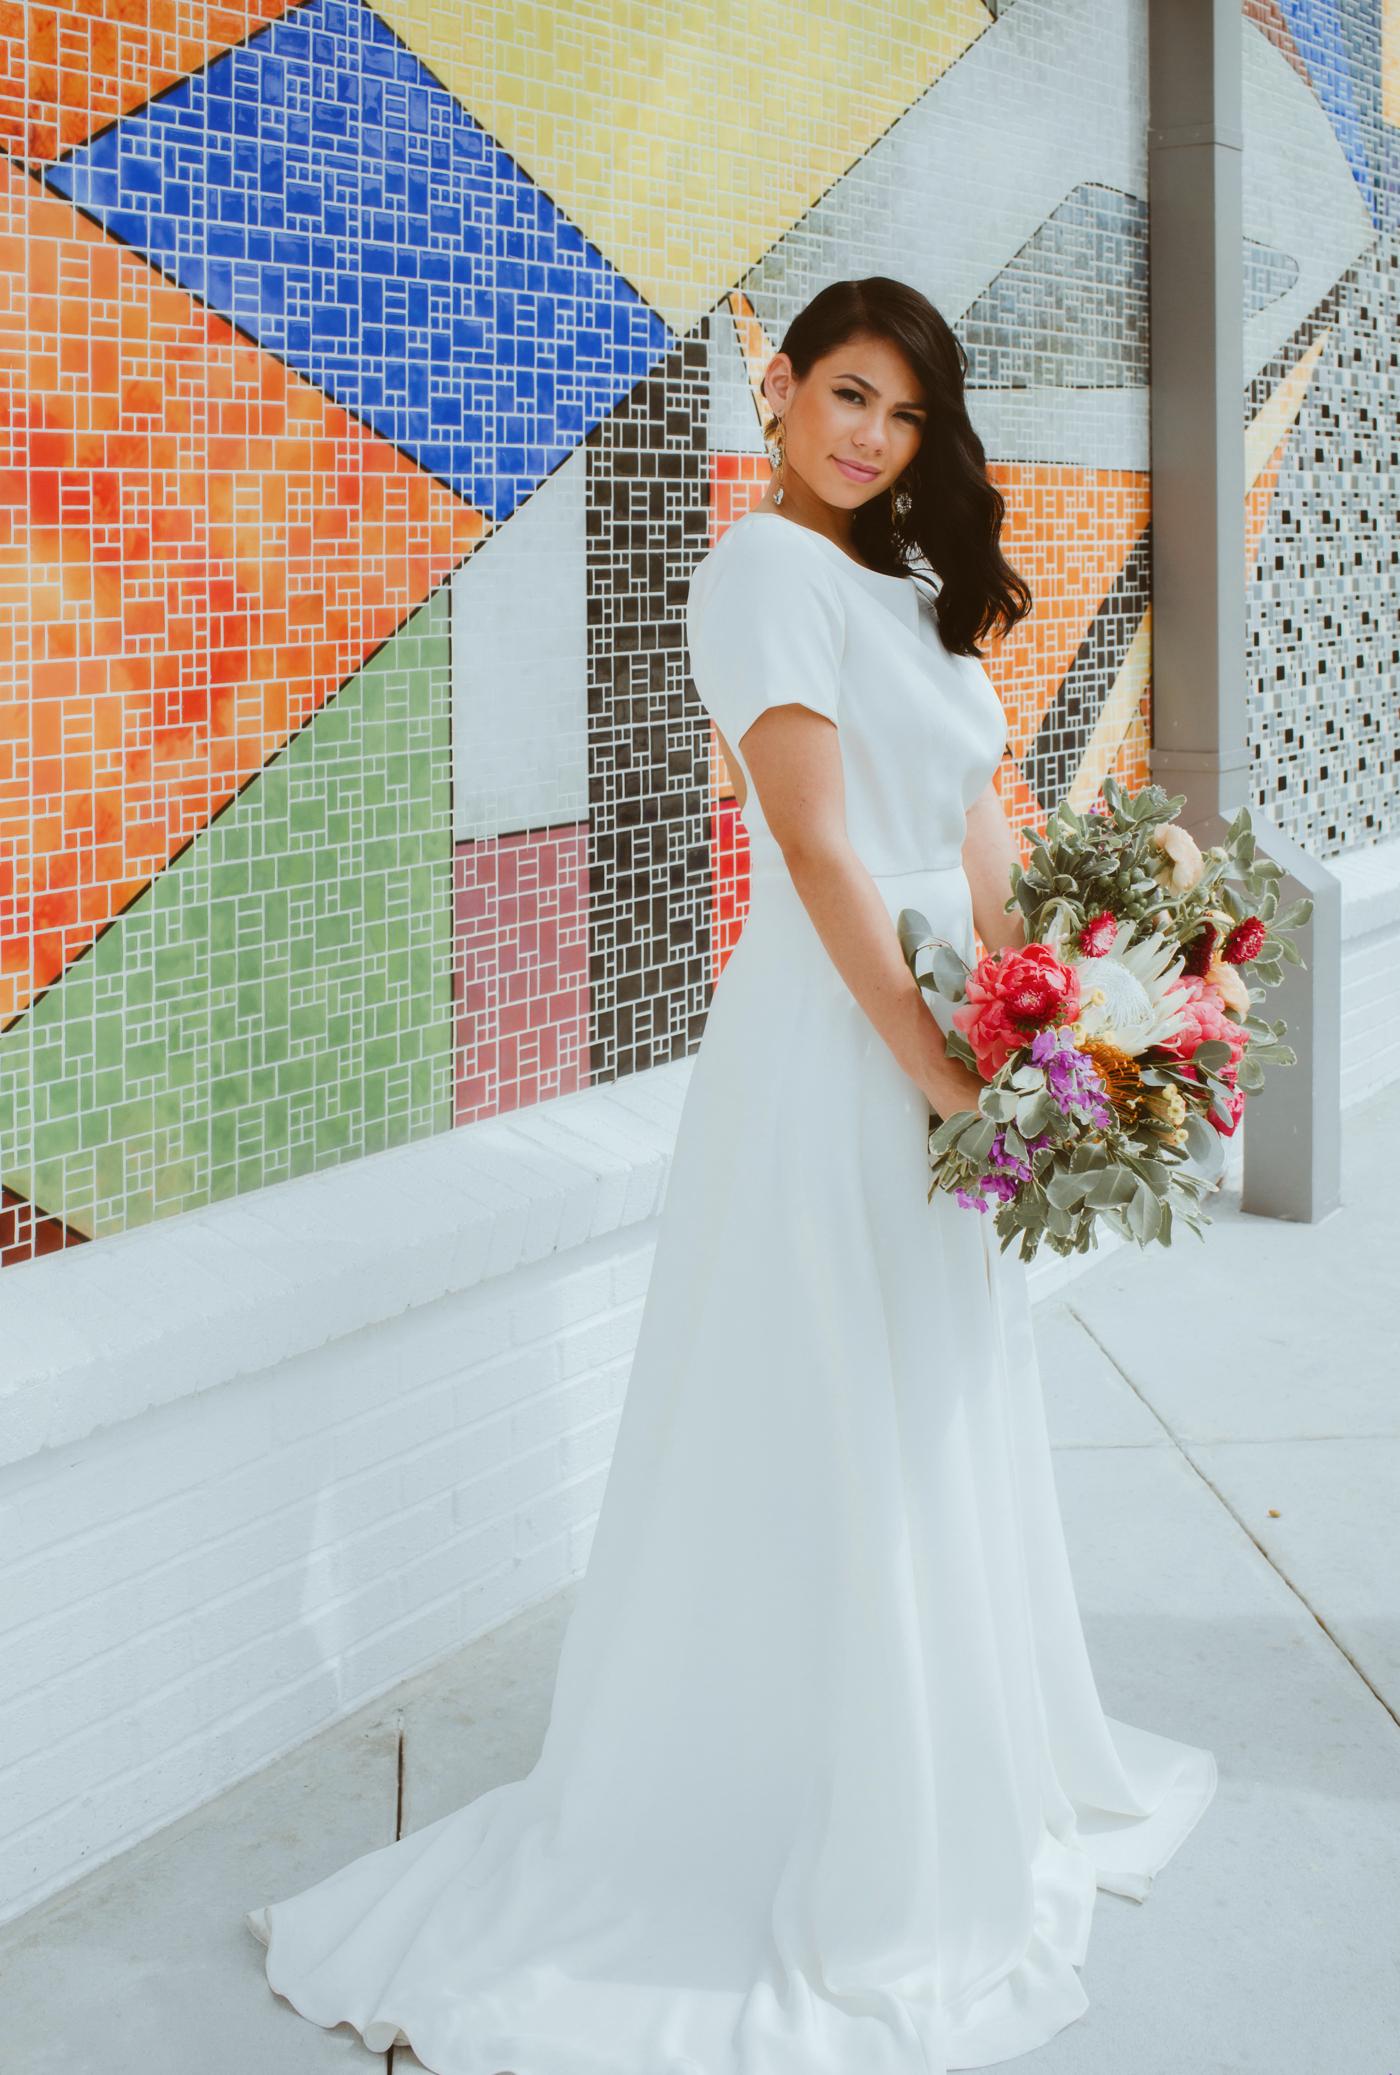 Wedding | Canvas Market | Lake Nona-Orlando, FL  | Vanessa Boy Photography | vanessaboy.com-244.com |Green Wedding Shoes.jpg